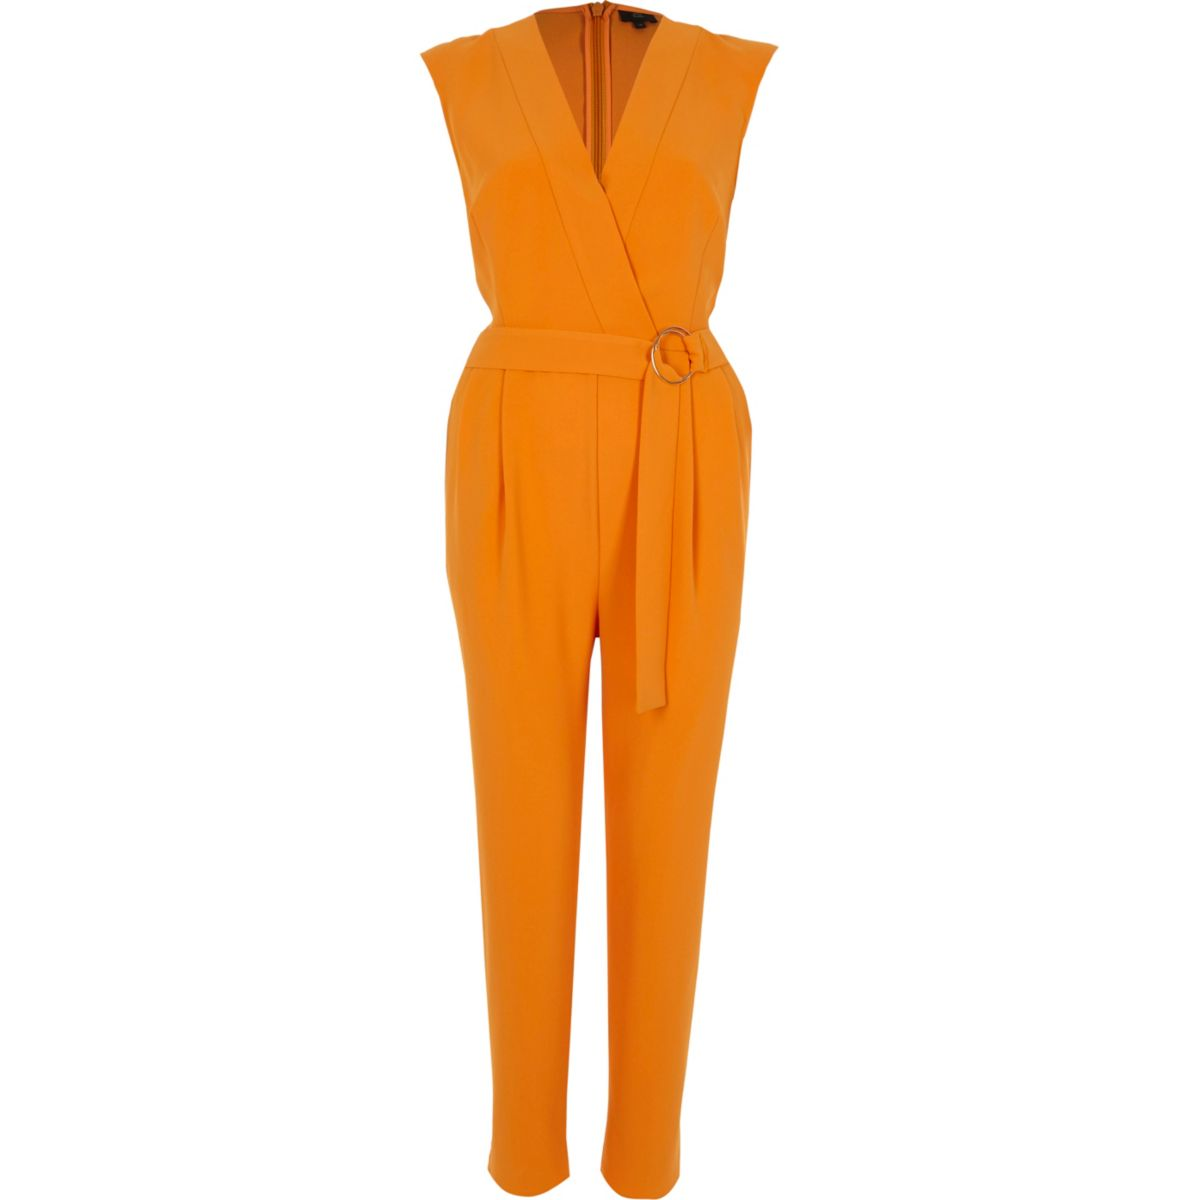 Orange sleeveless tailored jumpsuit